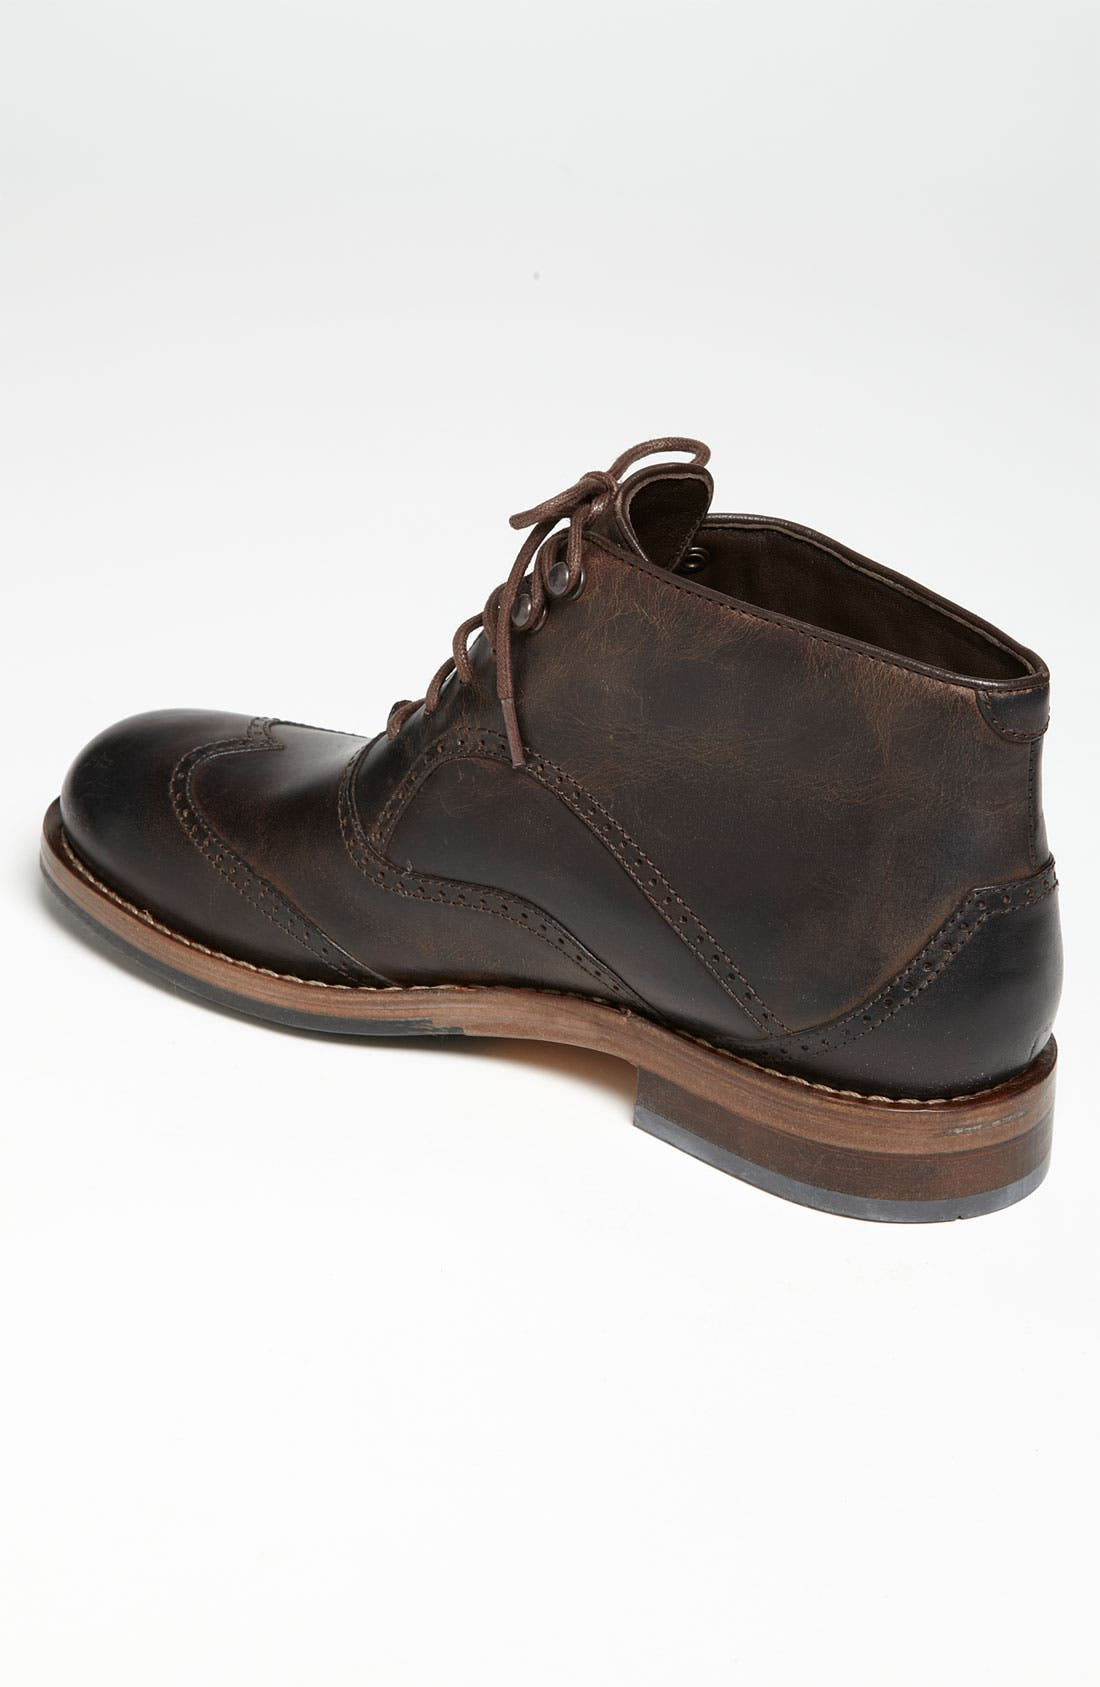 Alternate Image 2  - Wolverine 'Wesley' Chukka Boot (Regular Retail Price: $294.00)